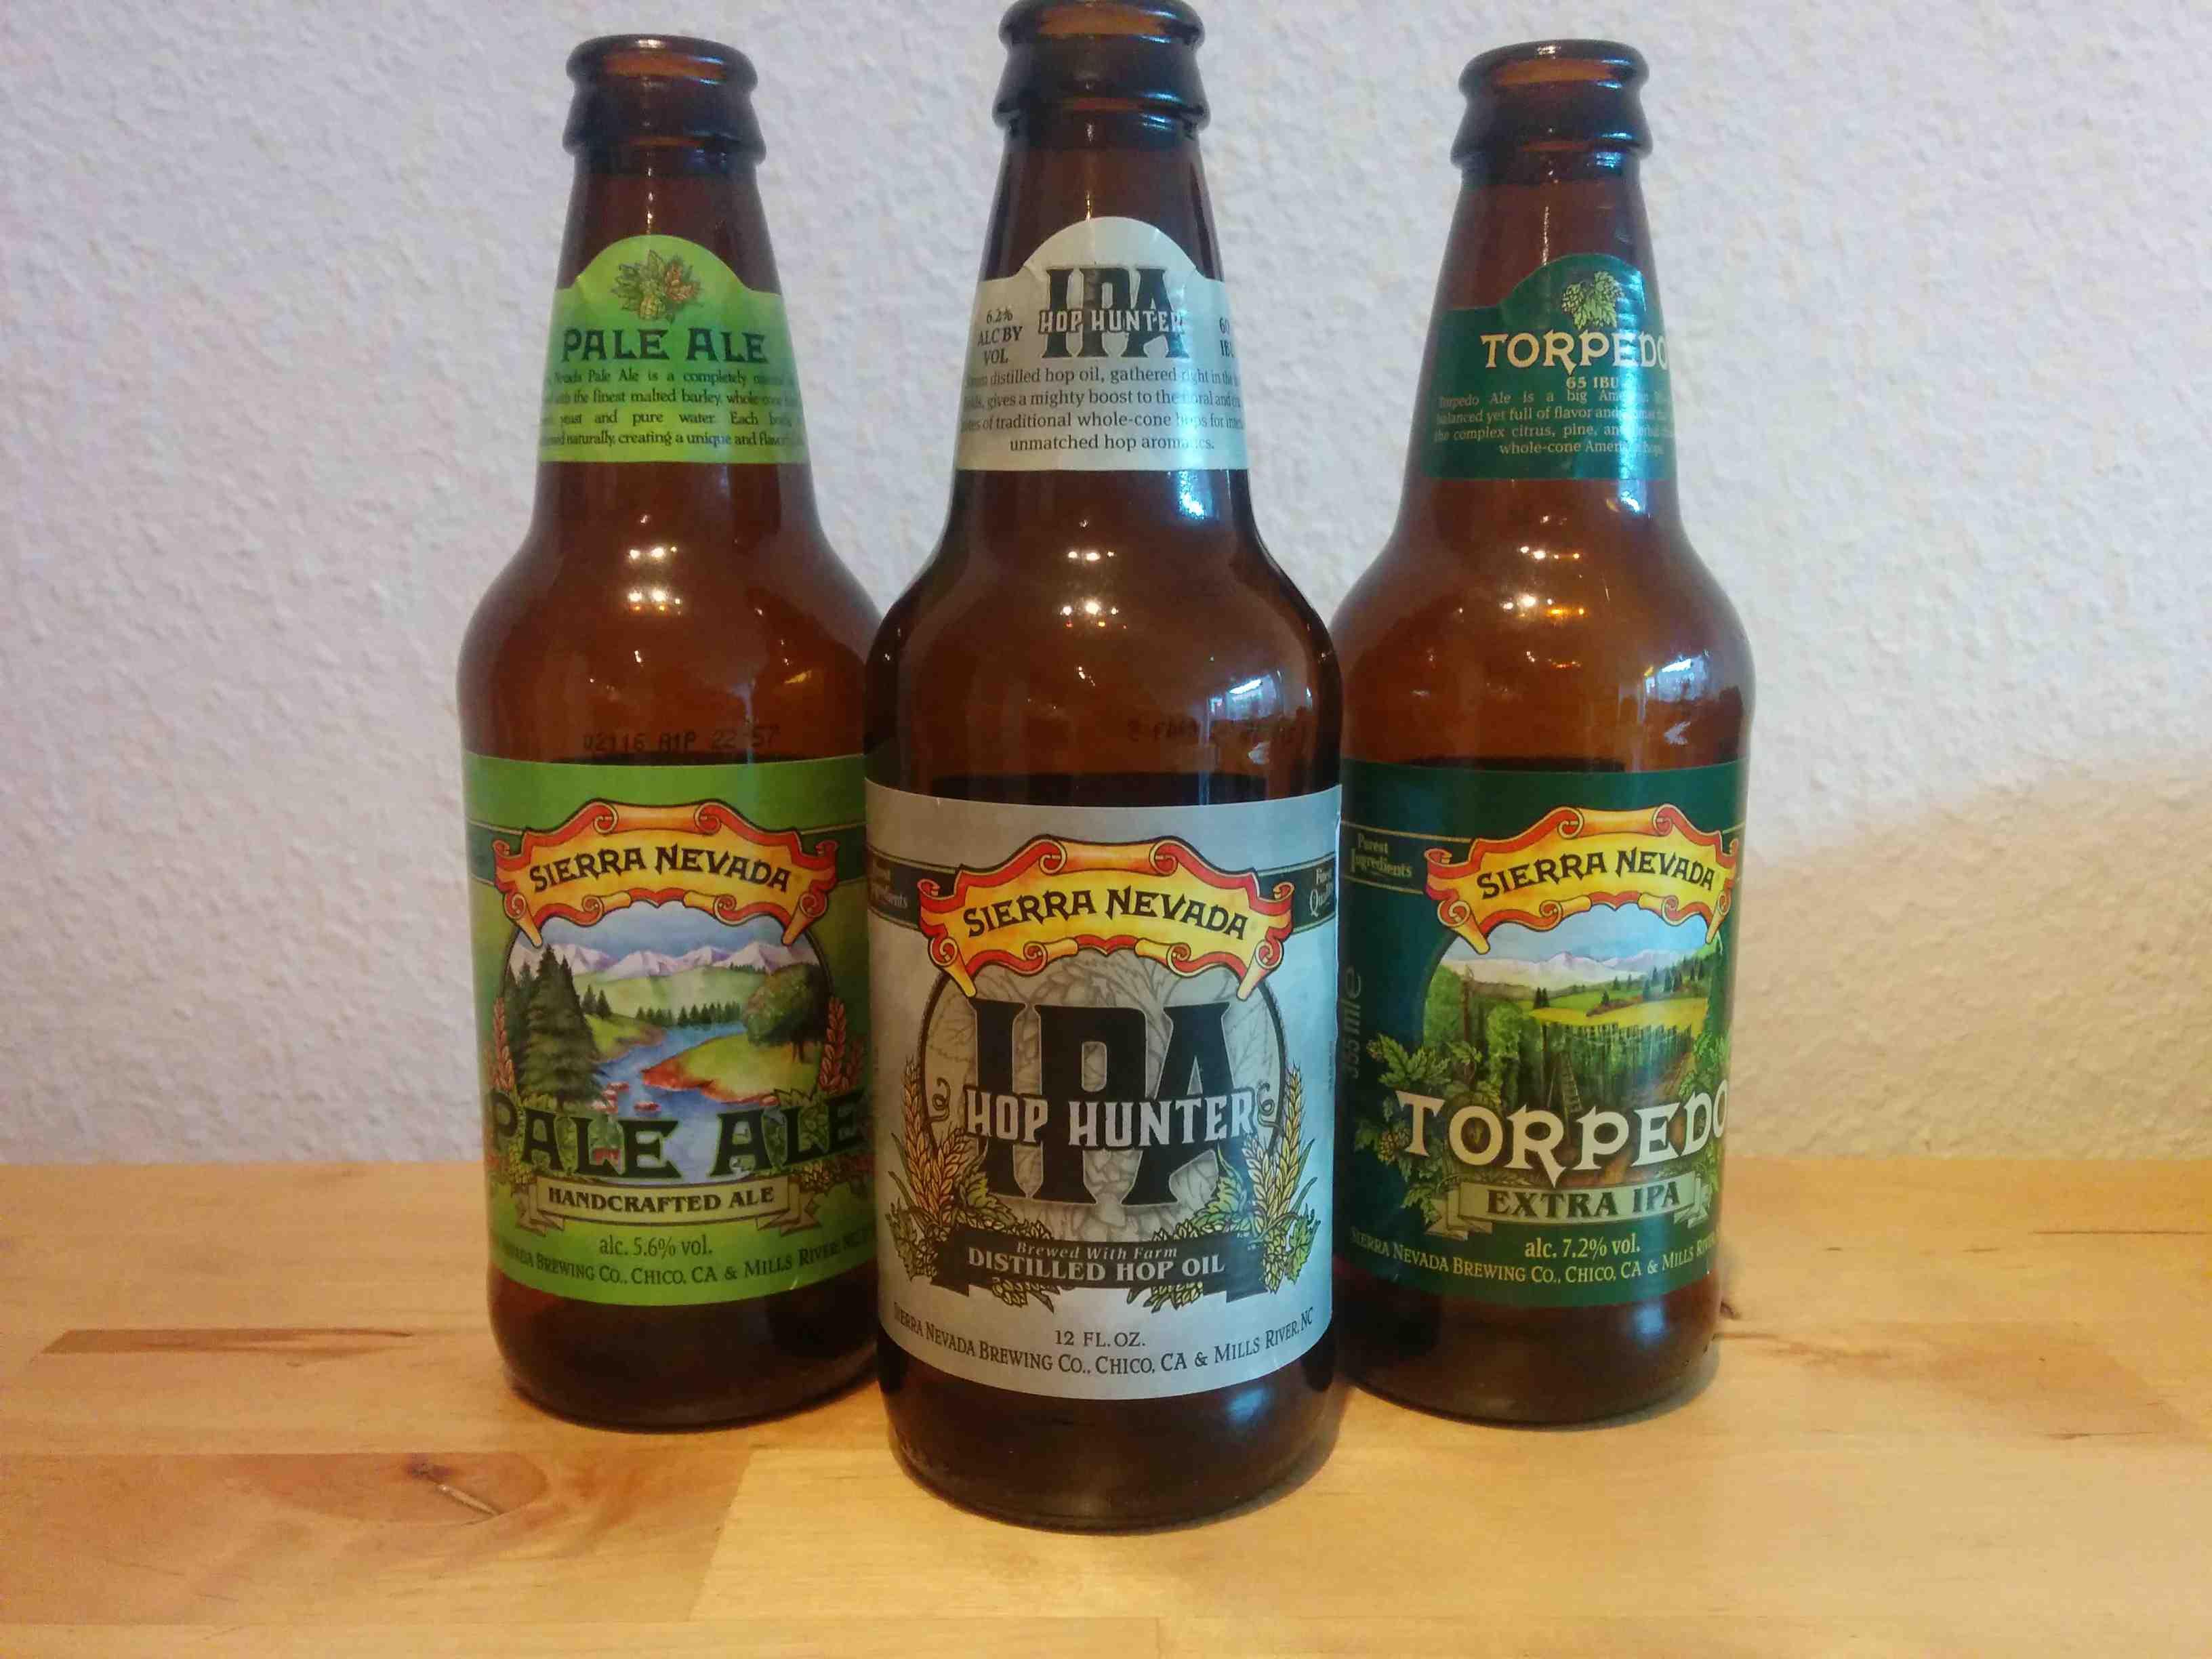 Sierra Nevada de tre øl på stribe